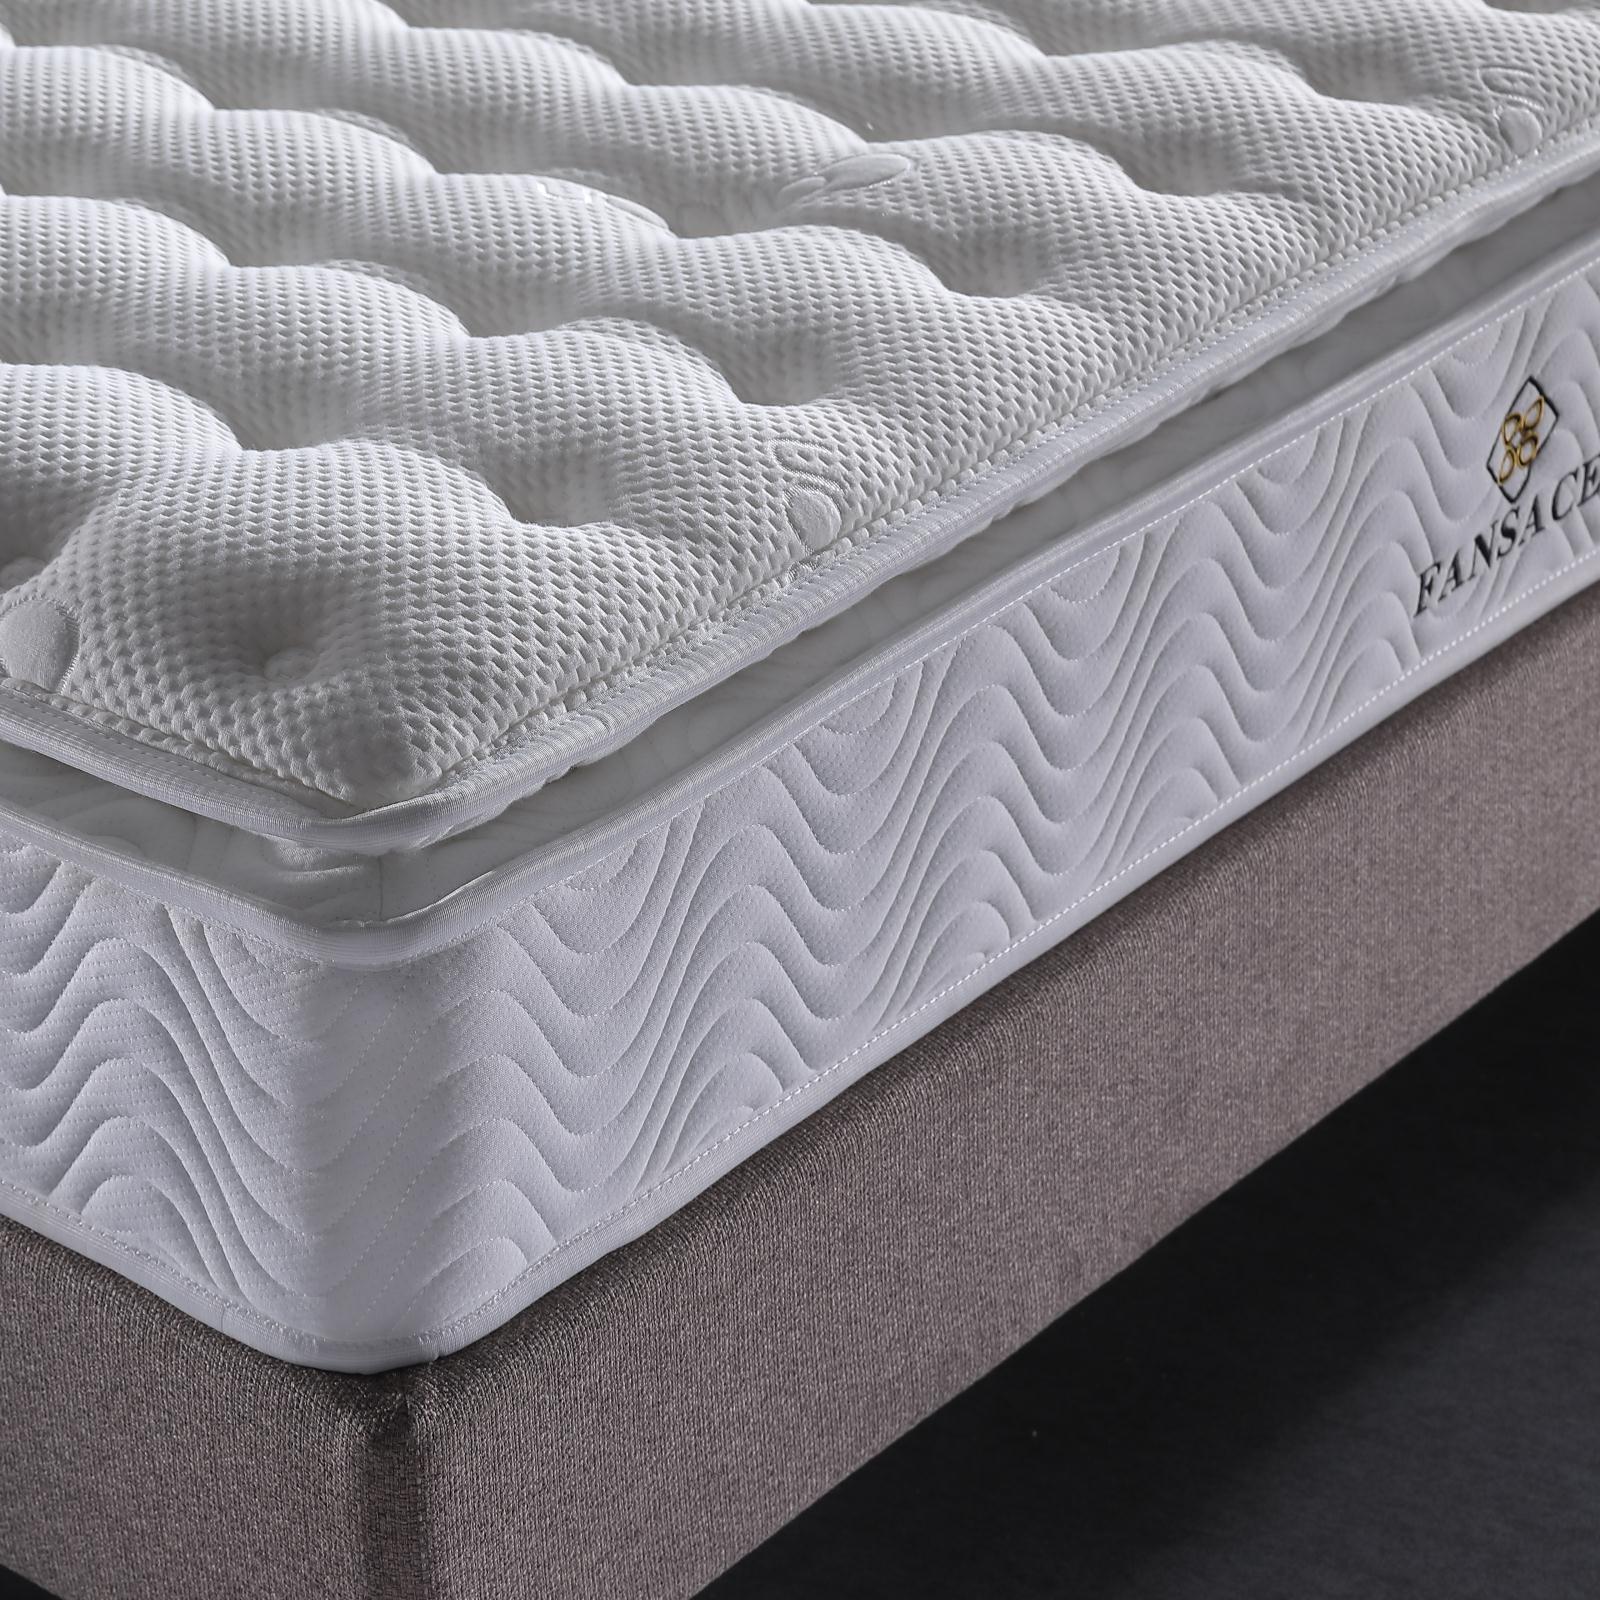 JLH foam orthopedic mattress marketing with elasticity-1